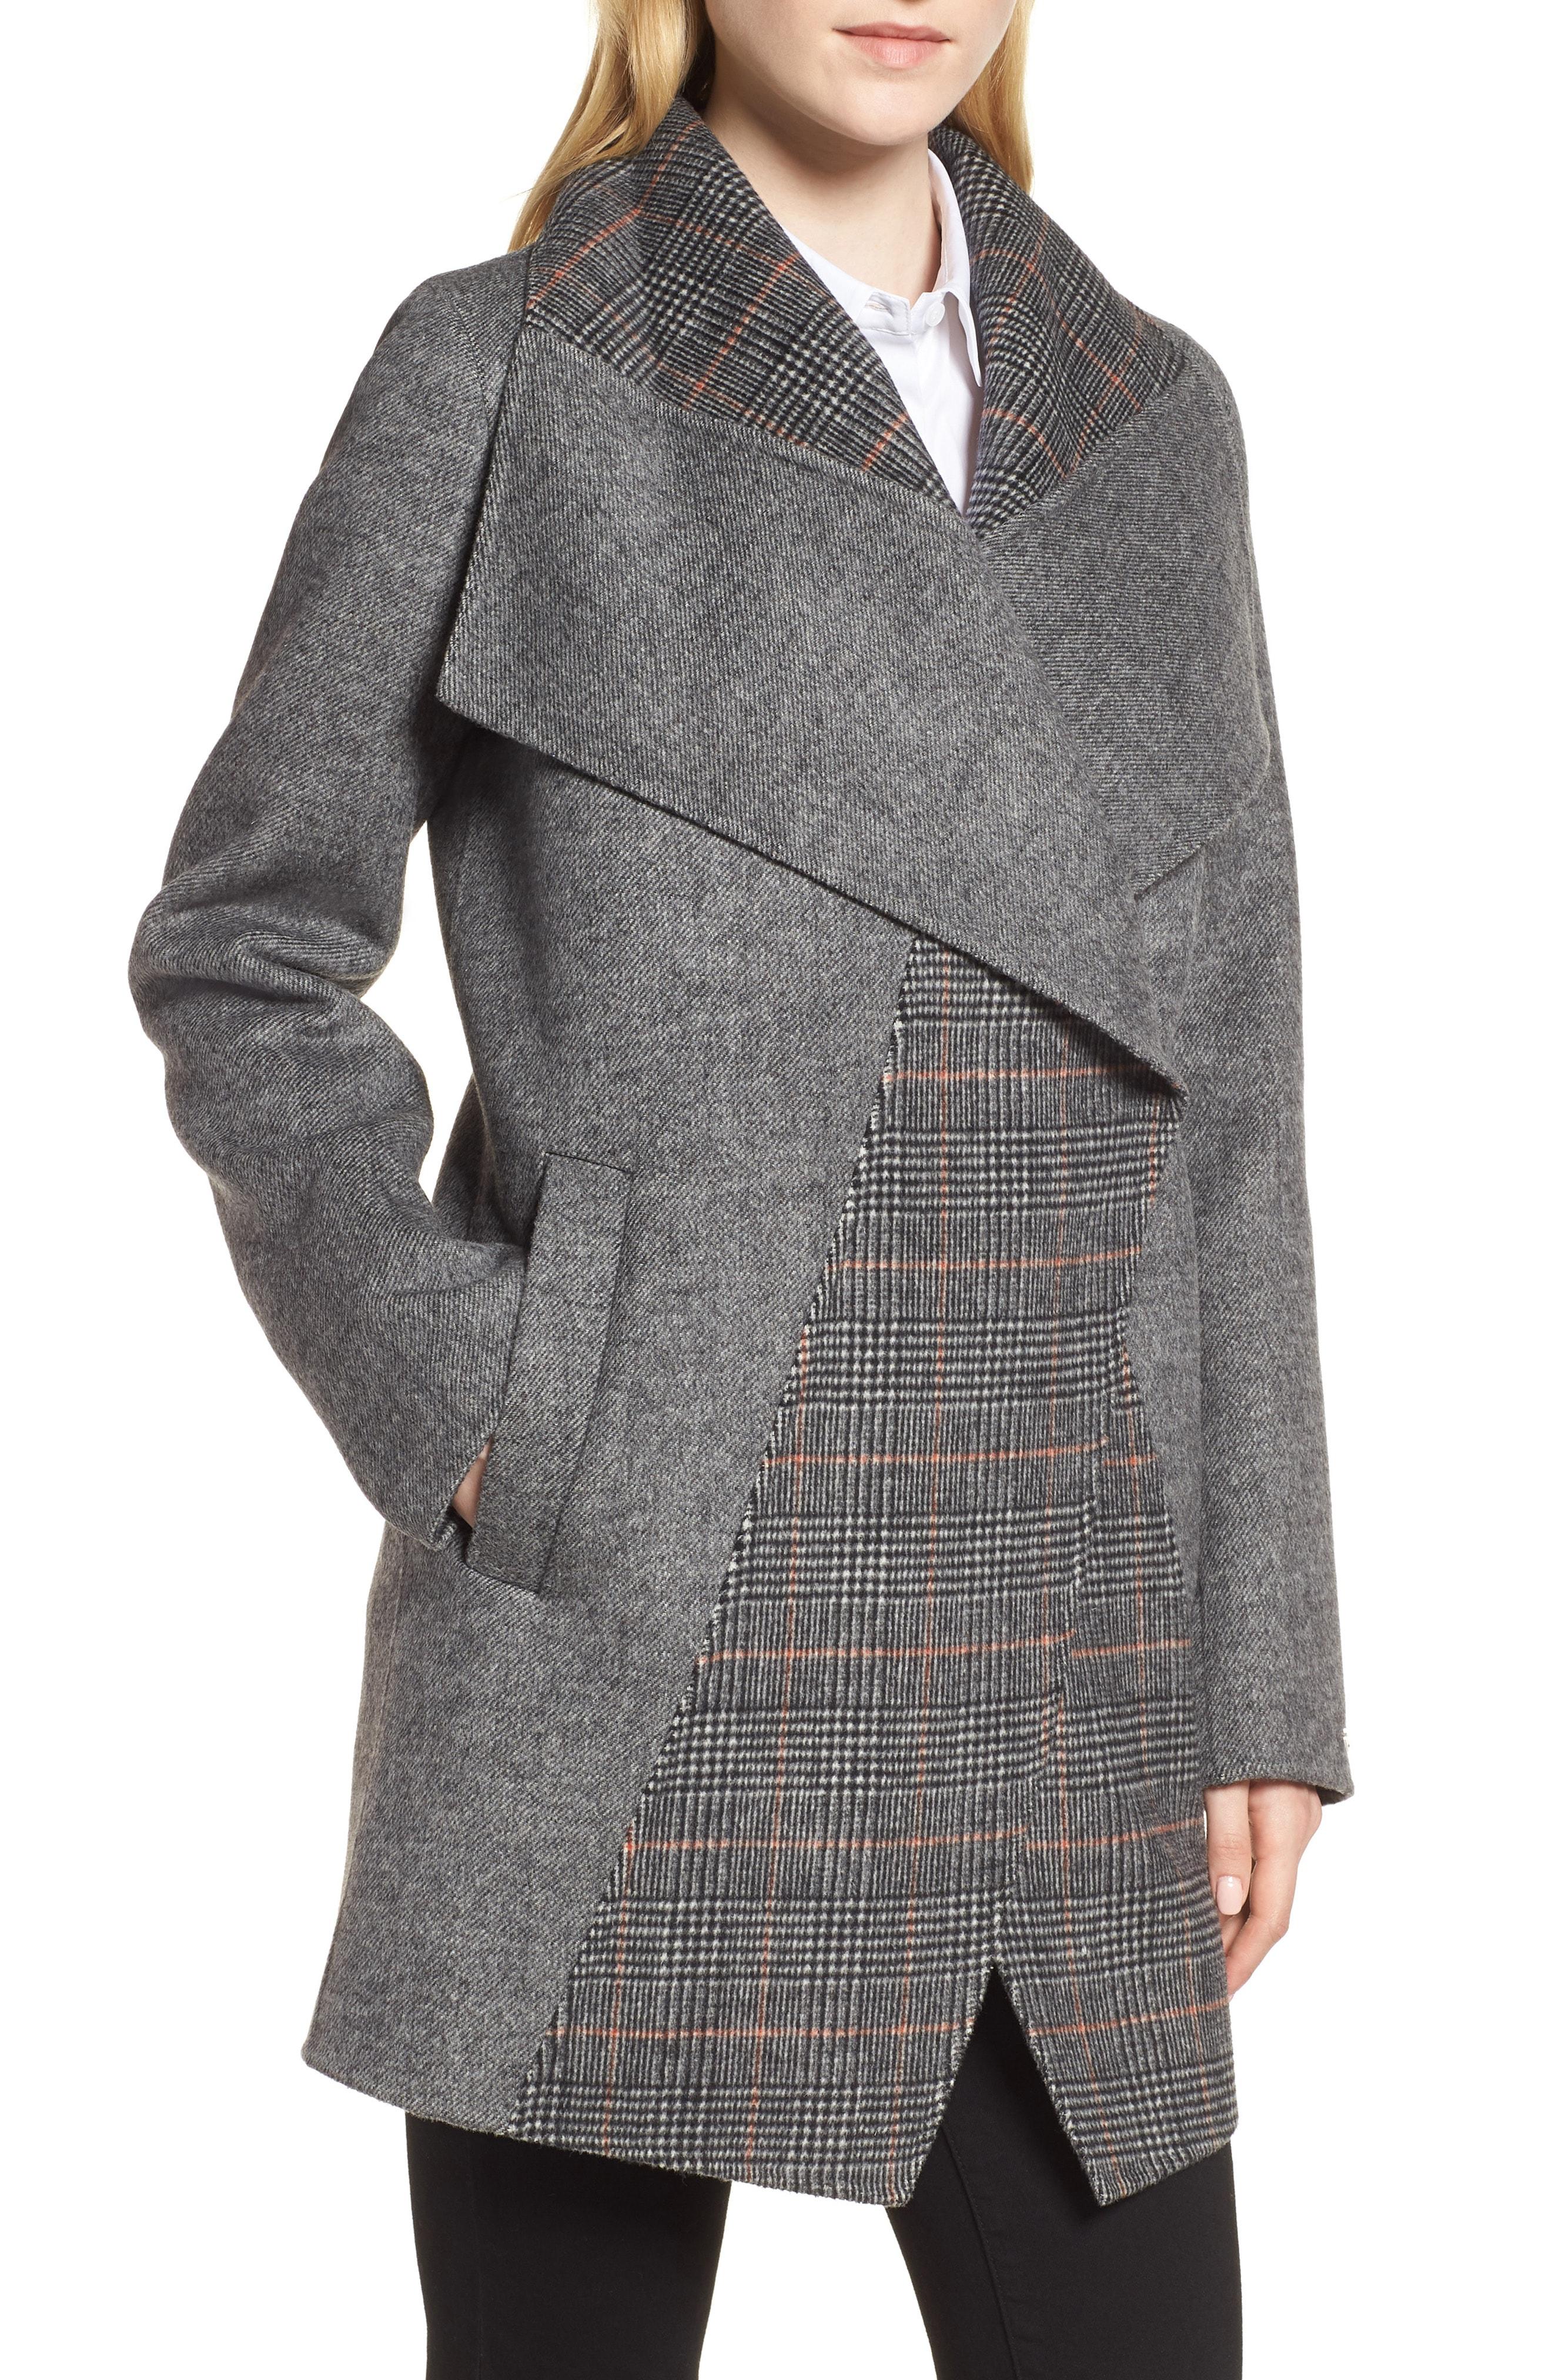 Tahari Nicky Double Face Wool Blend Oversize Coat (Regular & Petite)